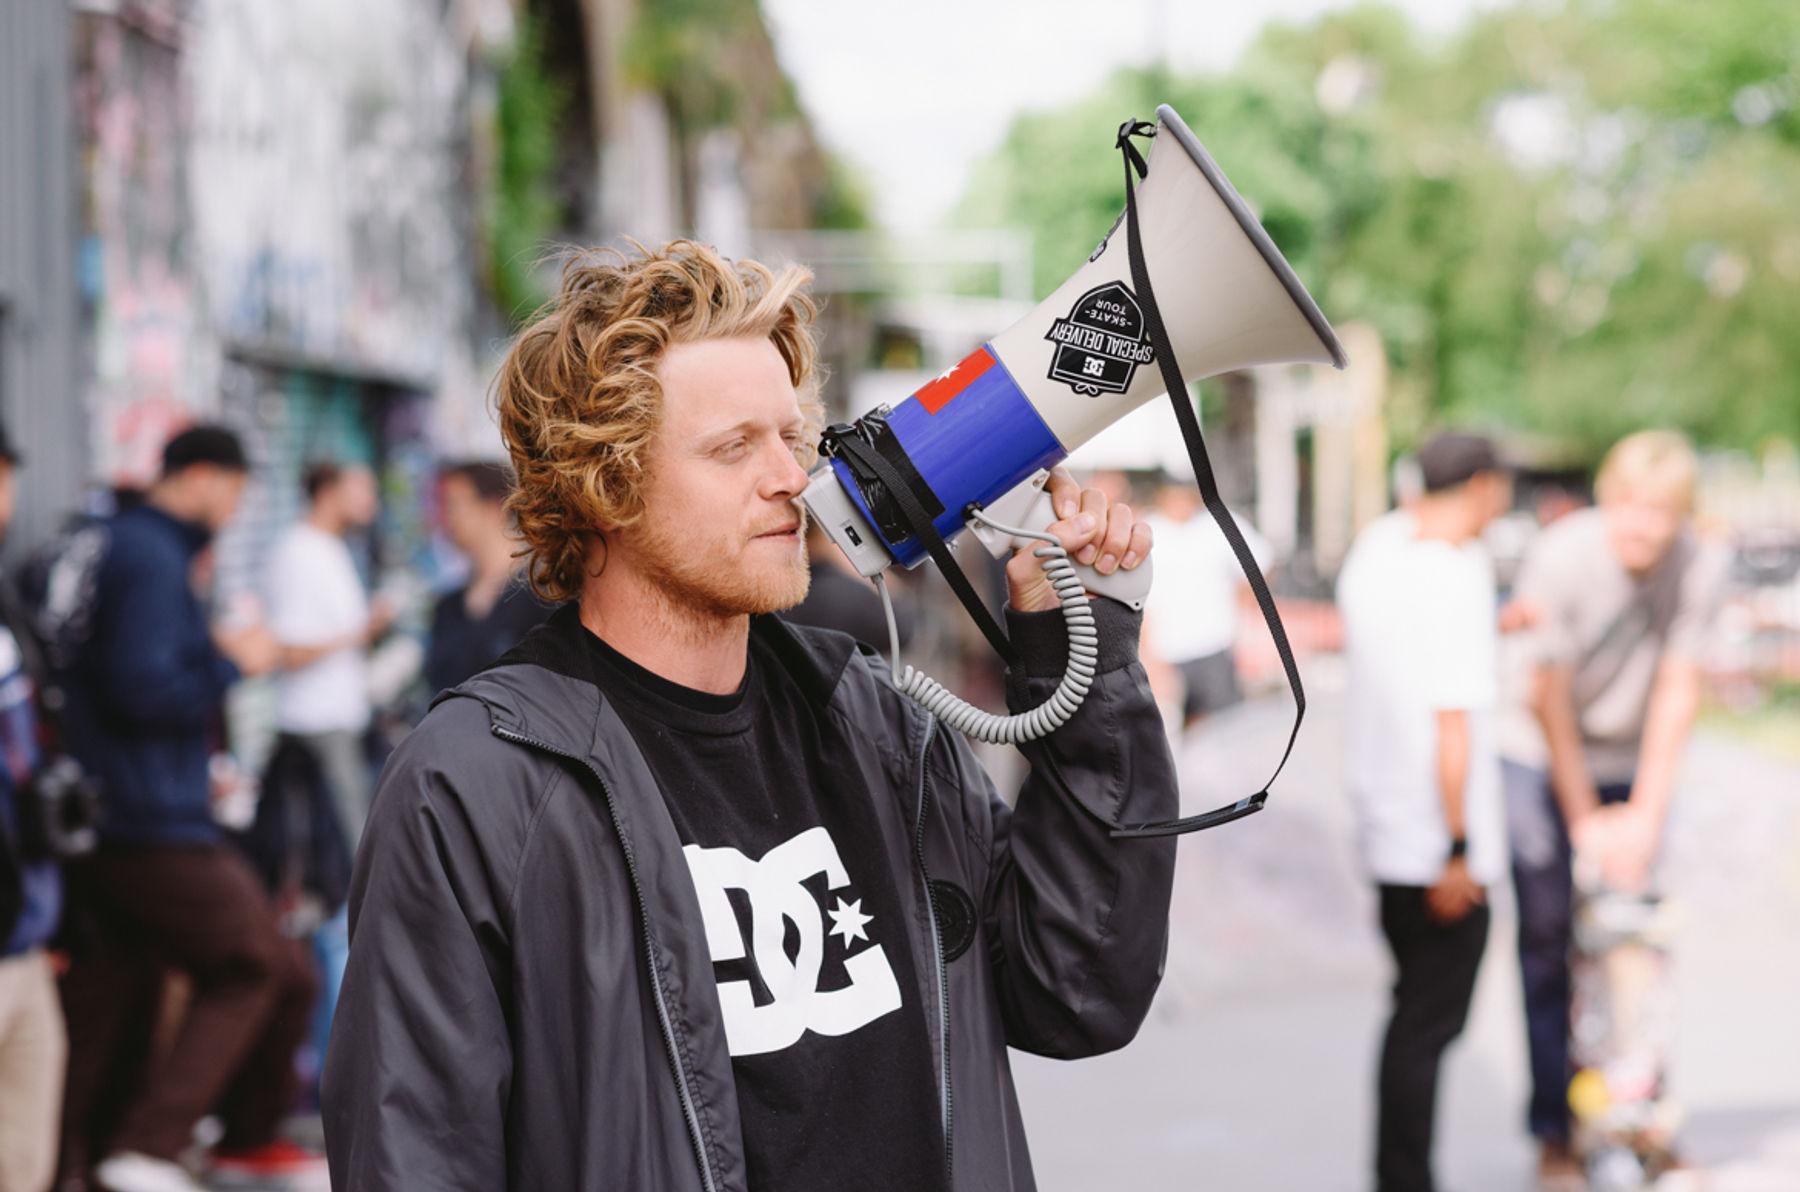 _IHC3572e-Wes-Kremer-DC-Special-Delivery-Skate-Tour-BTS-Demo-Mile-End-London-May-2015-Photographer-Maksim-Kalanep